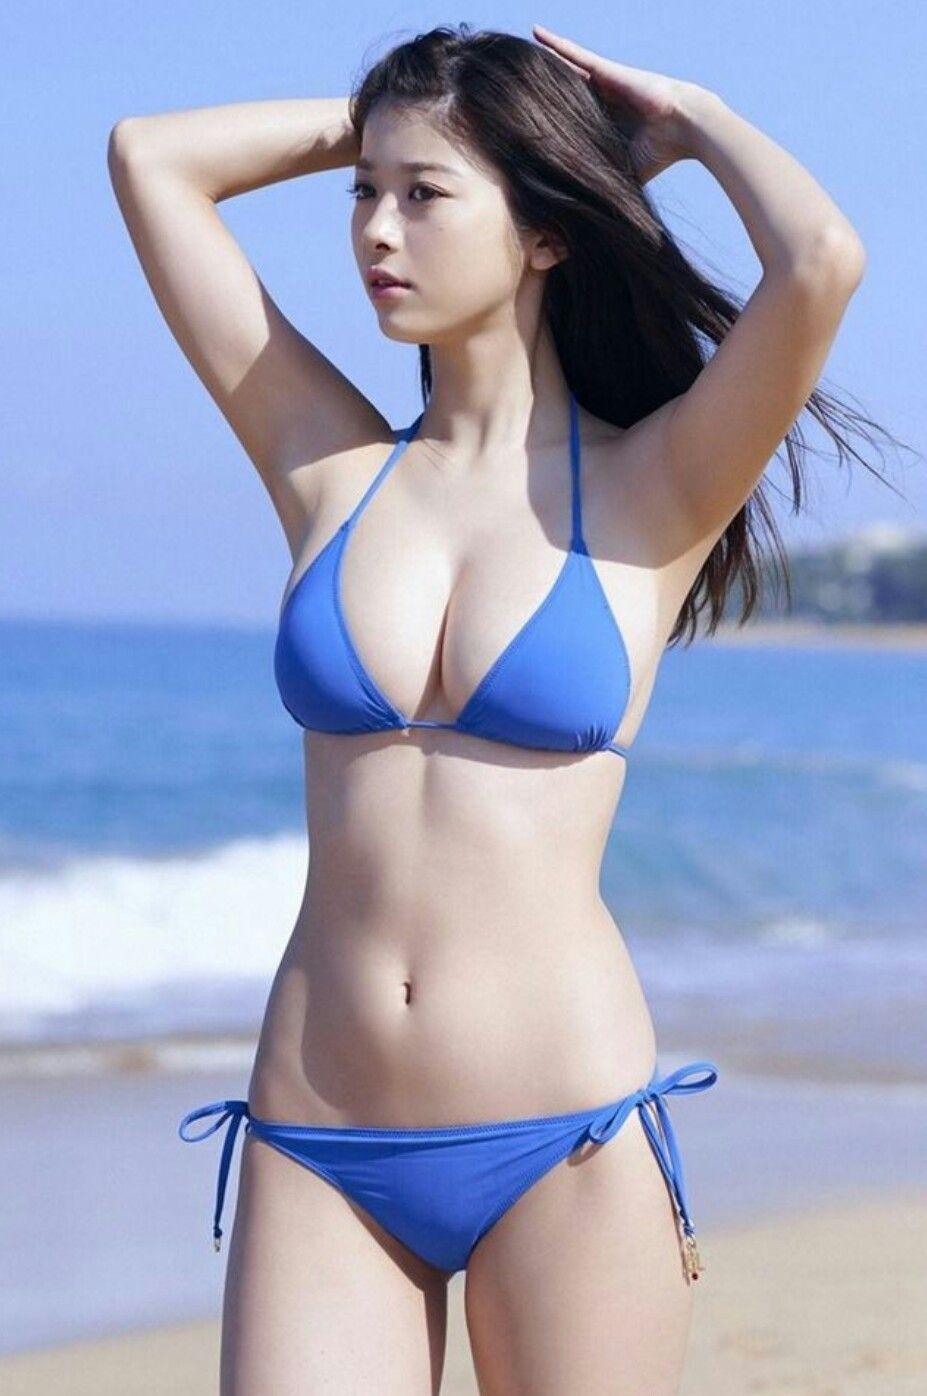 Sexy asian woman in bikini swimsuit posing outdoor poster